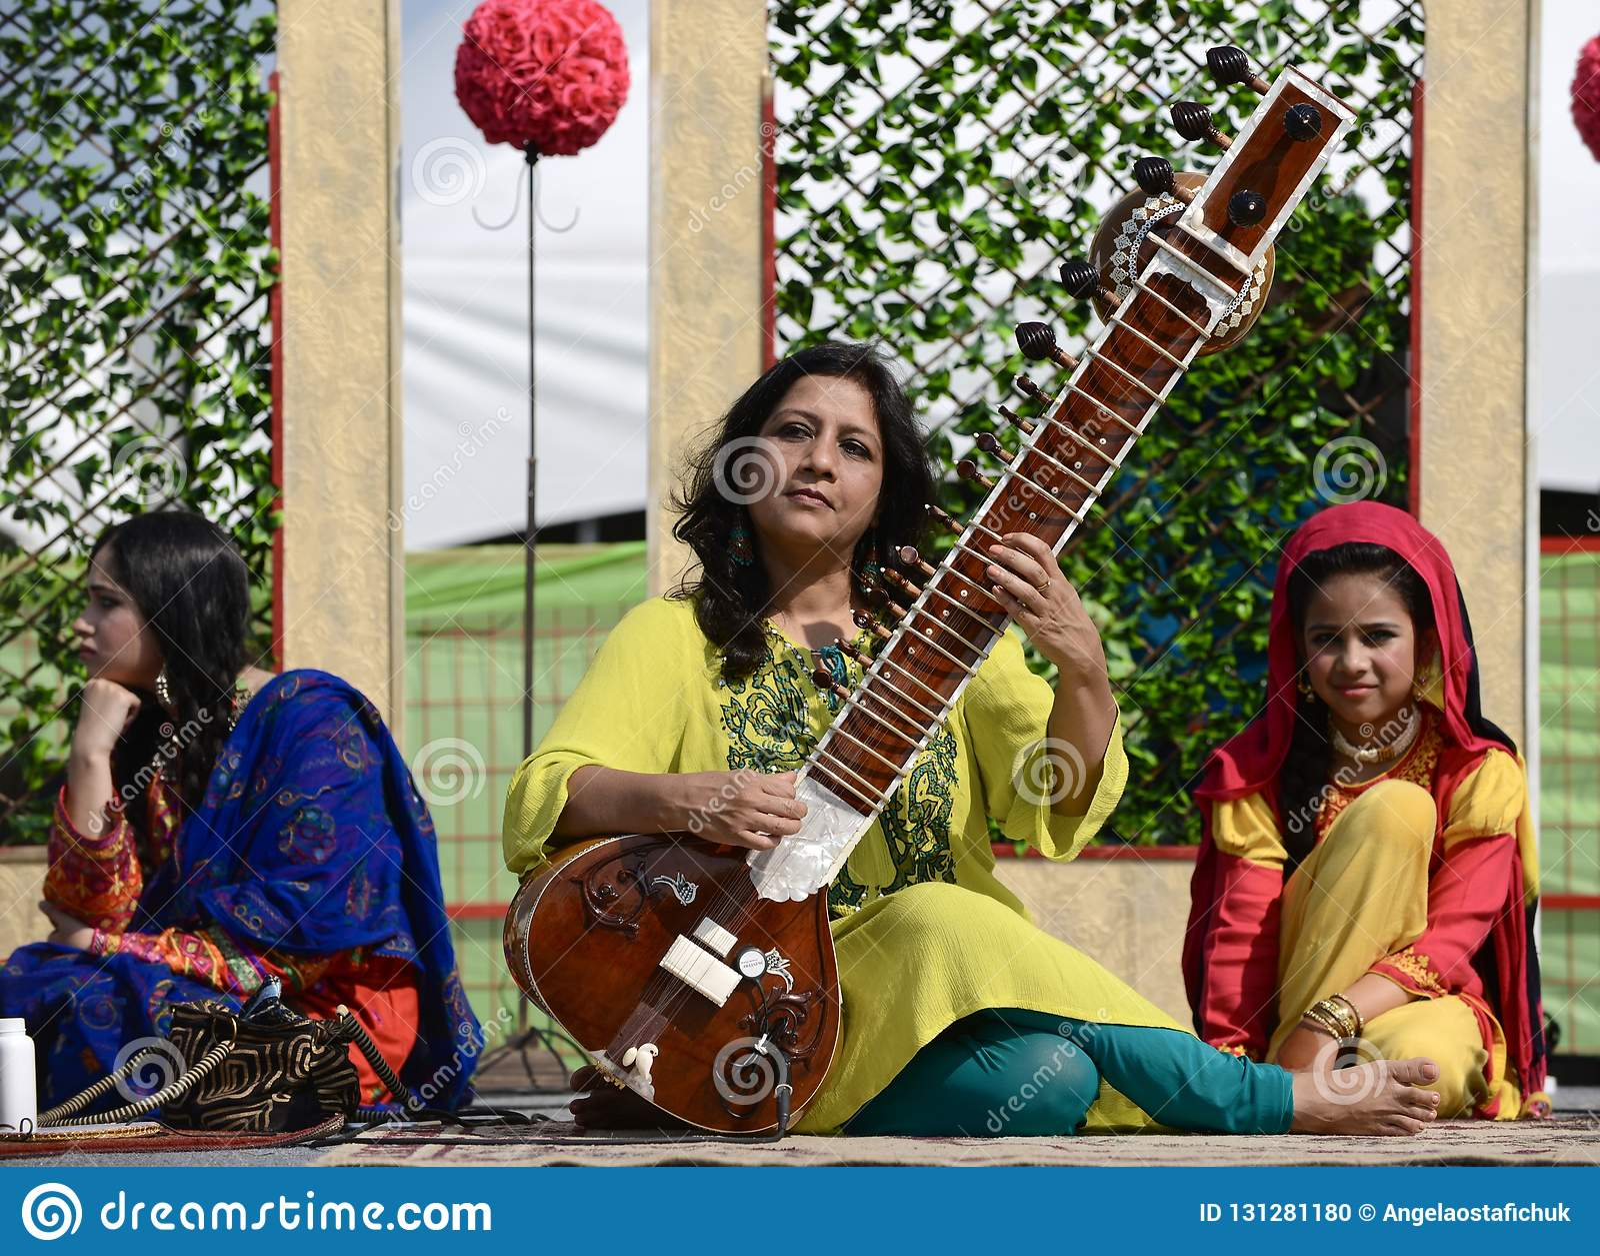 Edmonton, Canada-August 5, 2018: Performers at the Pakistan pavilion at Edmonton`s Heritage Days